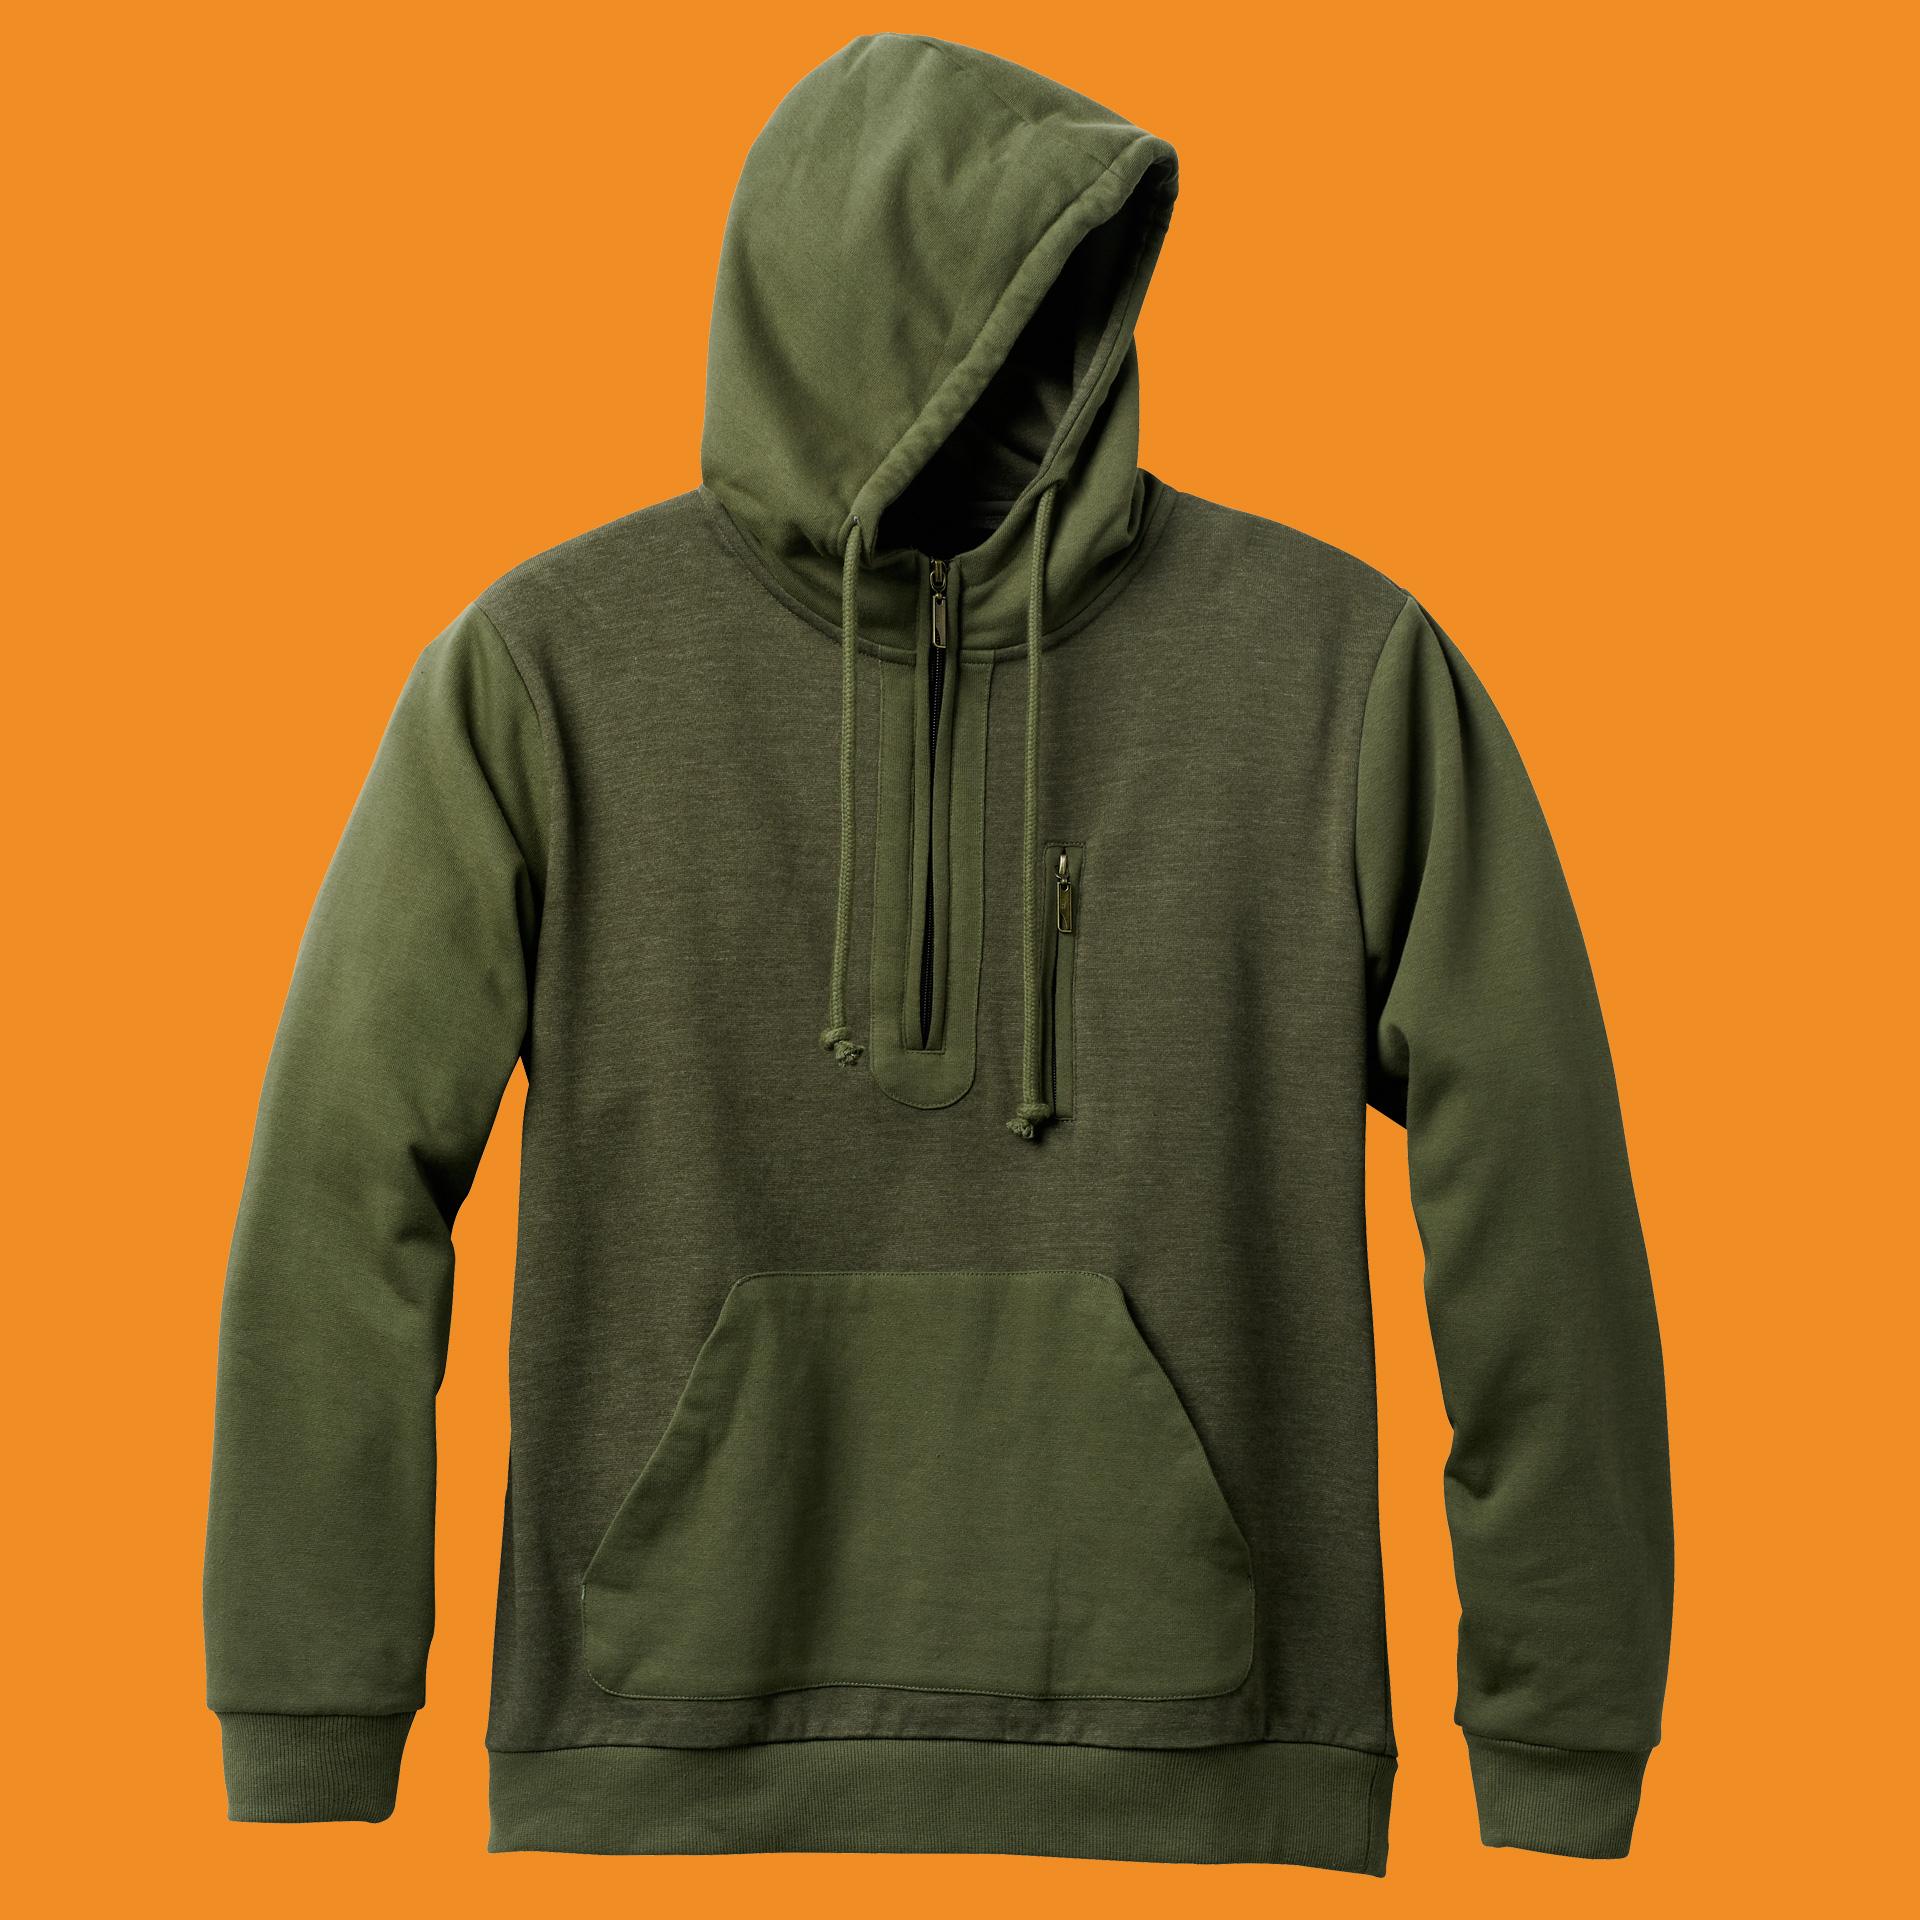 zippidy. hoodie